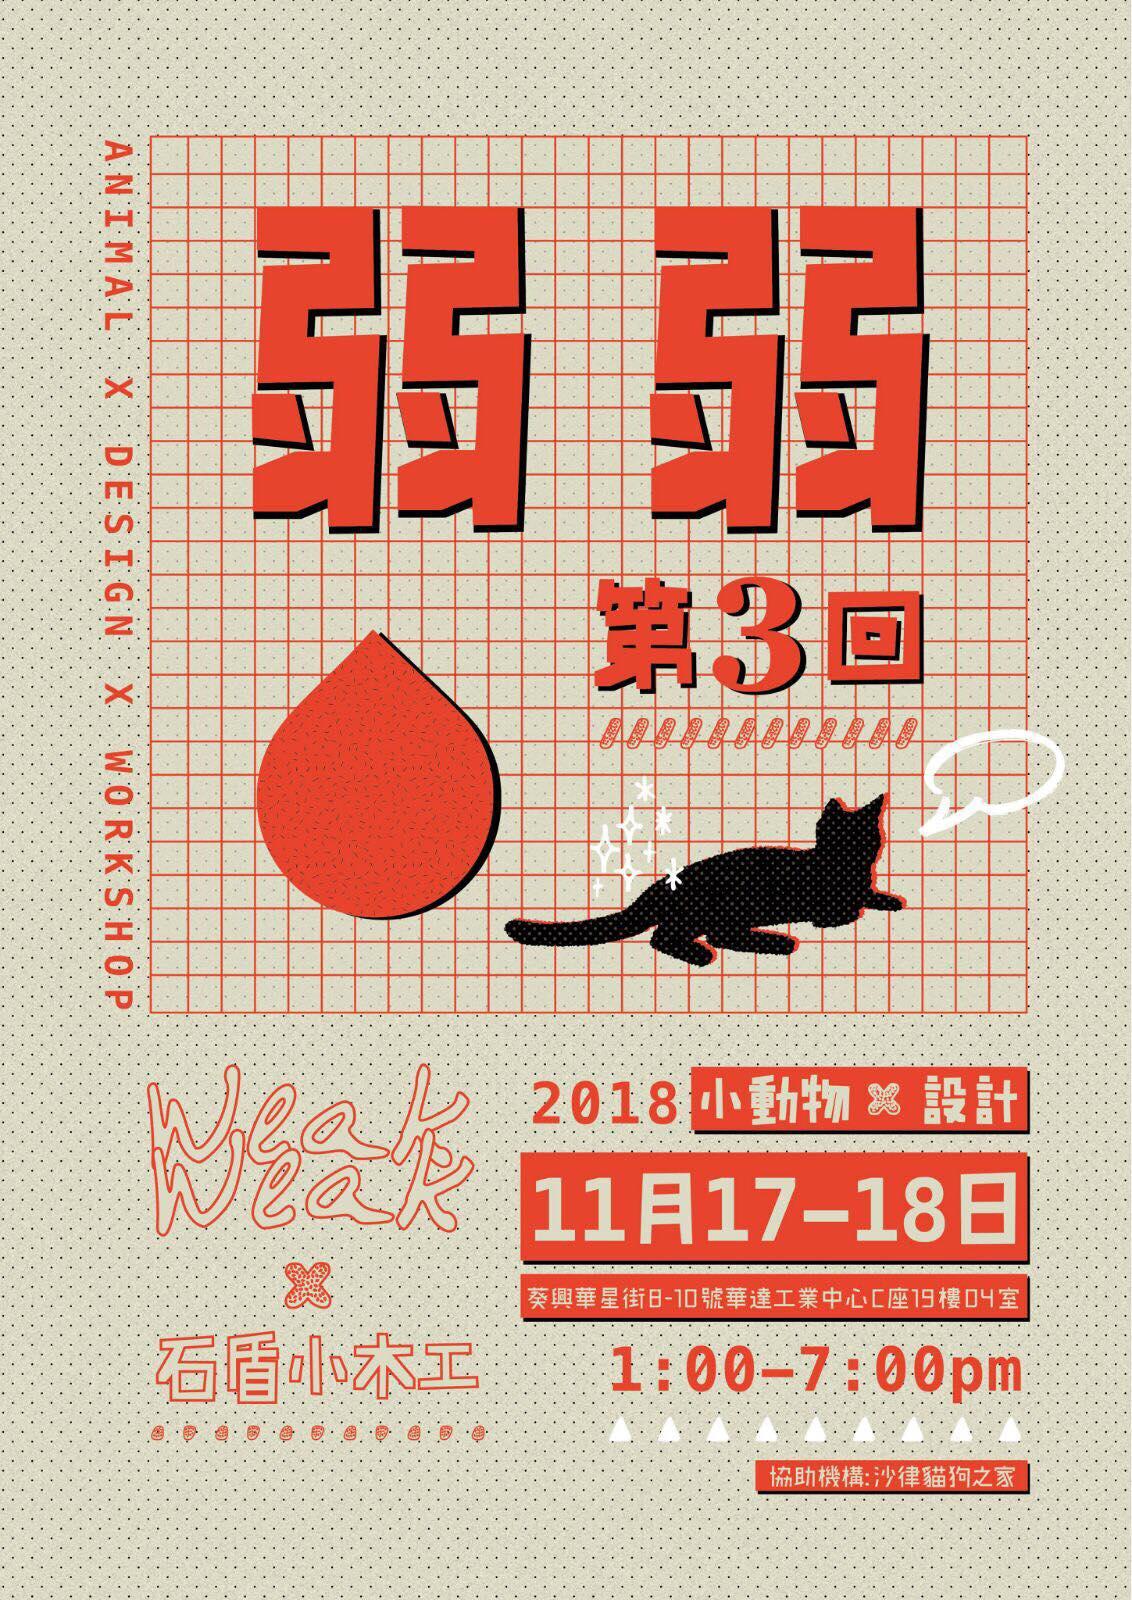 WeakWeak3_poster